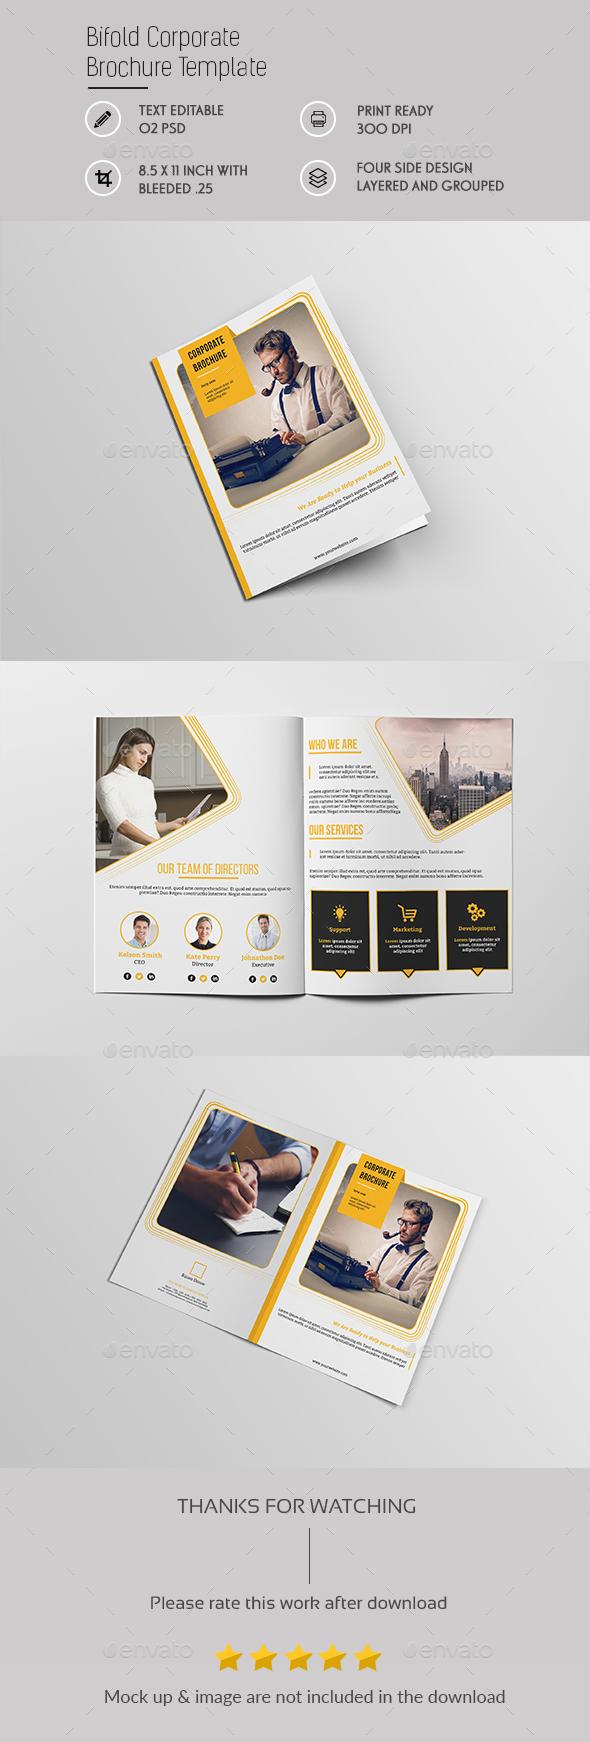 Bifold Corporate Brochure Template - Brochures Print Templates